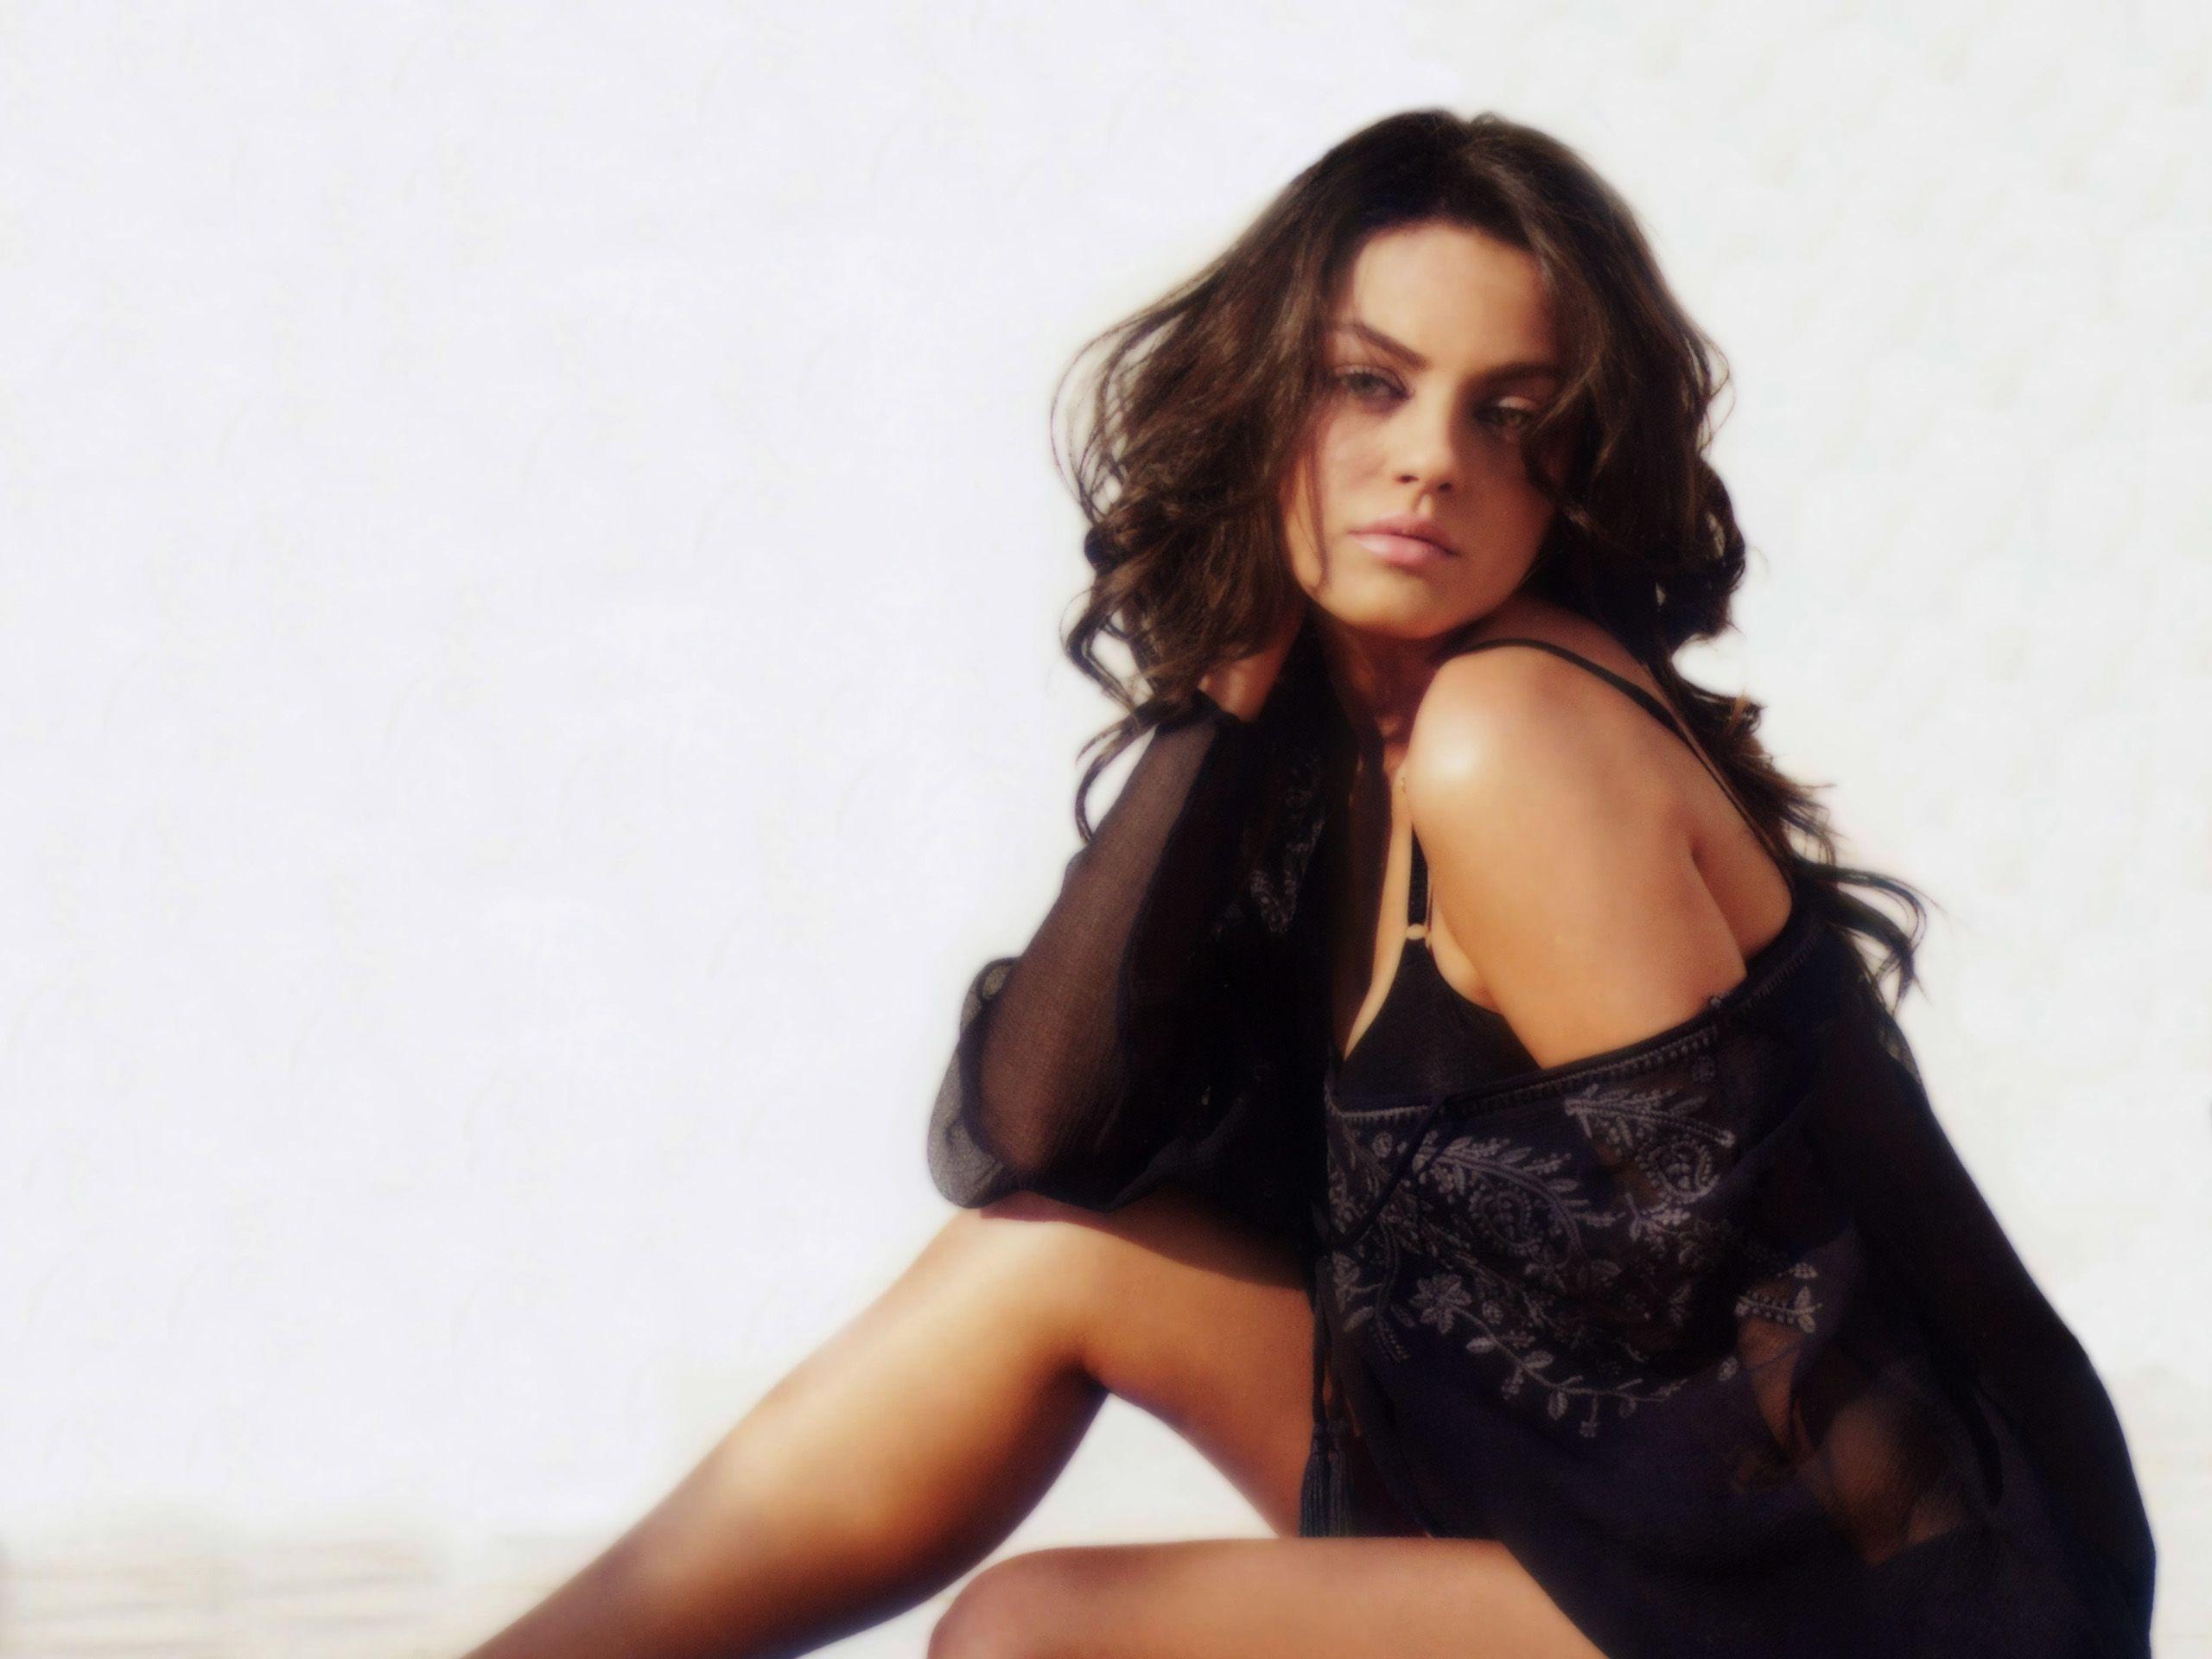 Mila Kunis Wallpaper 3 Backgrounds | Wallruru.